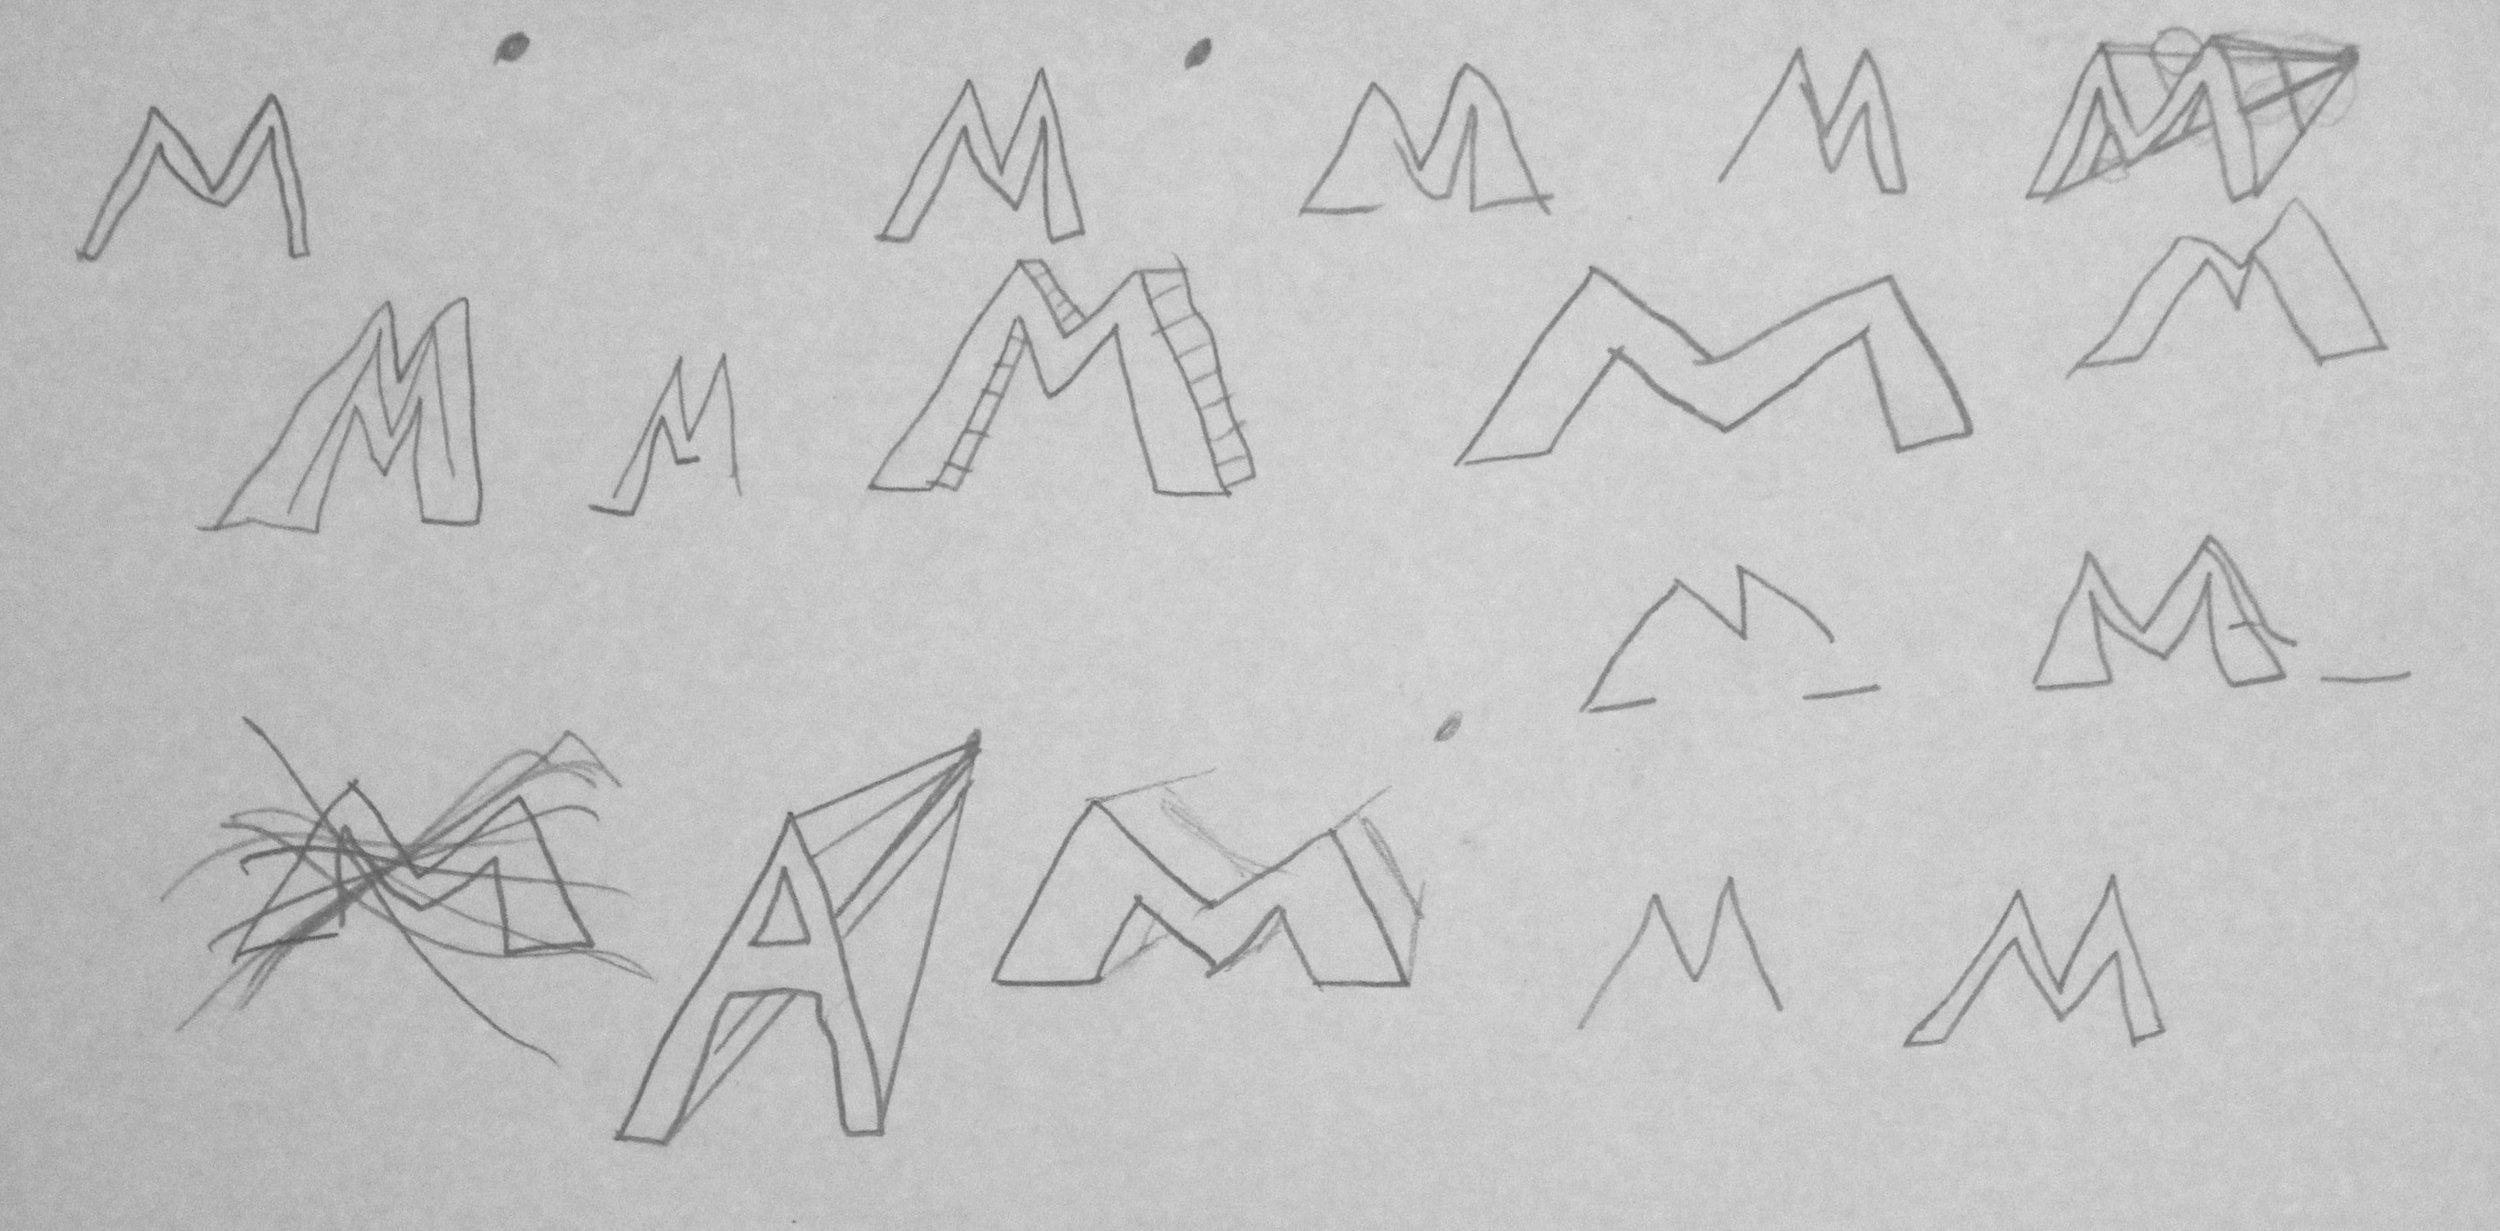 5th Grade: Matthew A. - Illuminated Initial Sketch Practice(Work In Progress)